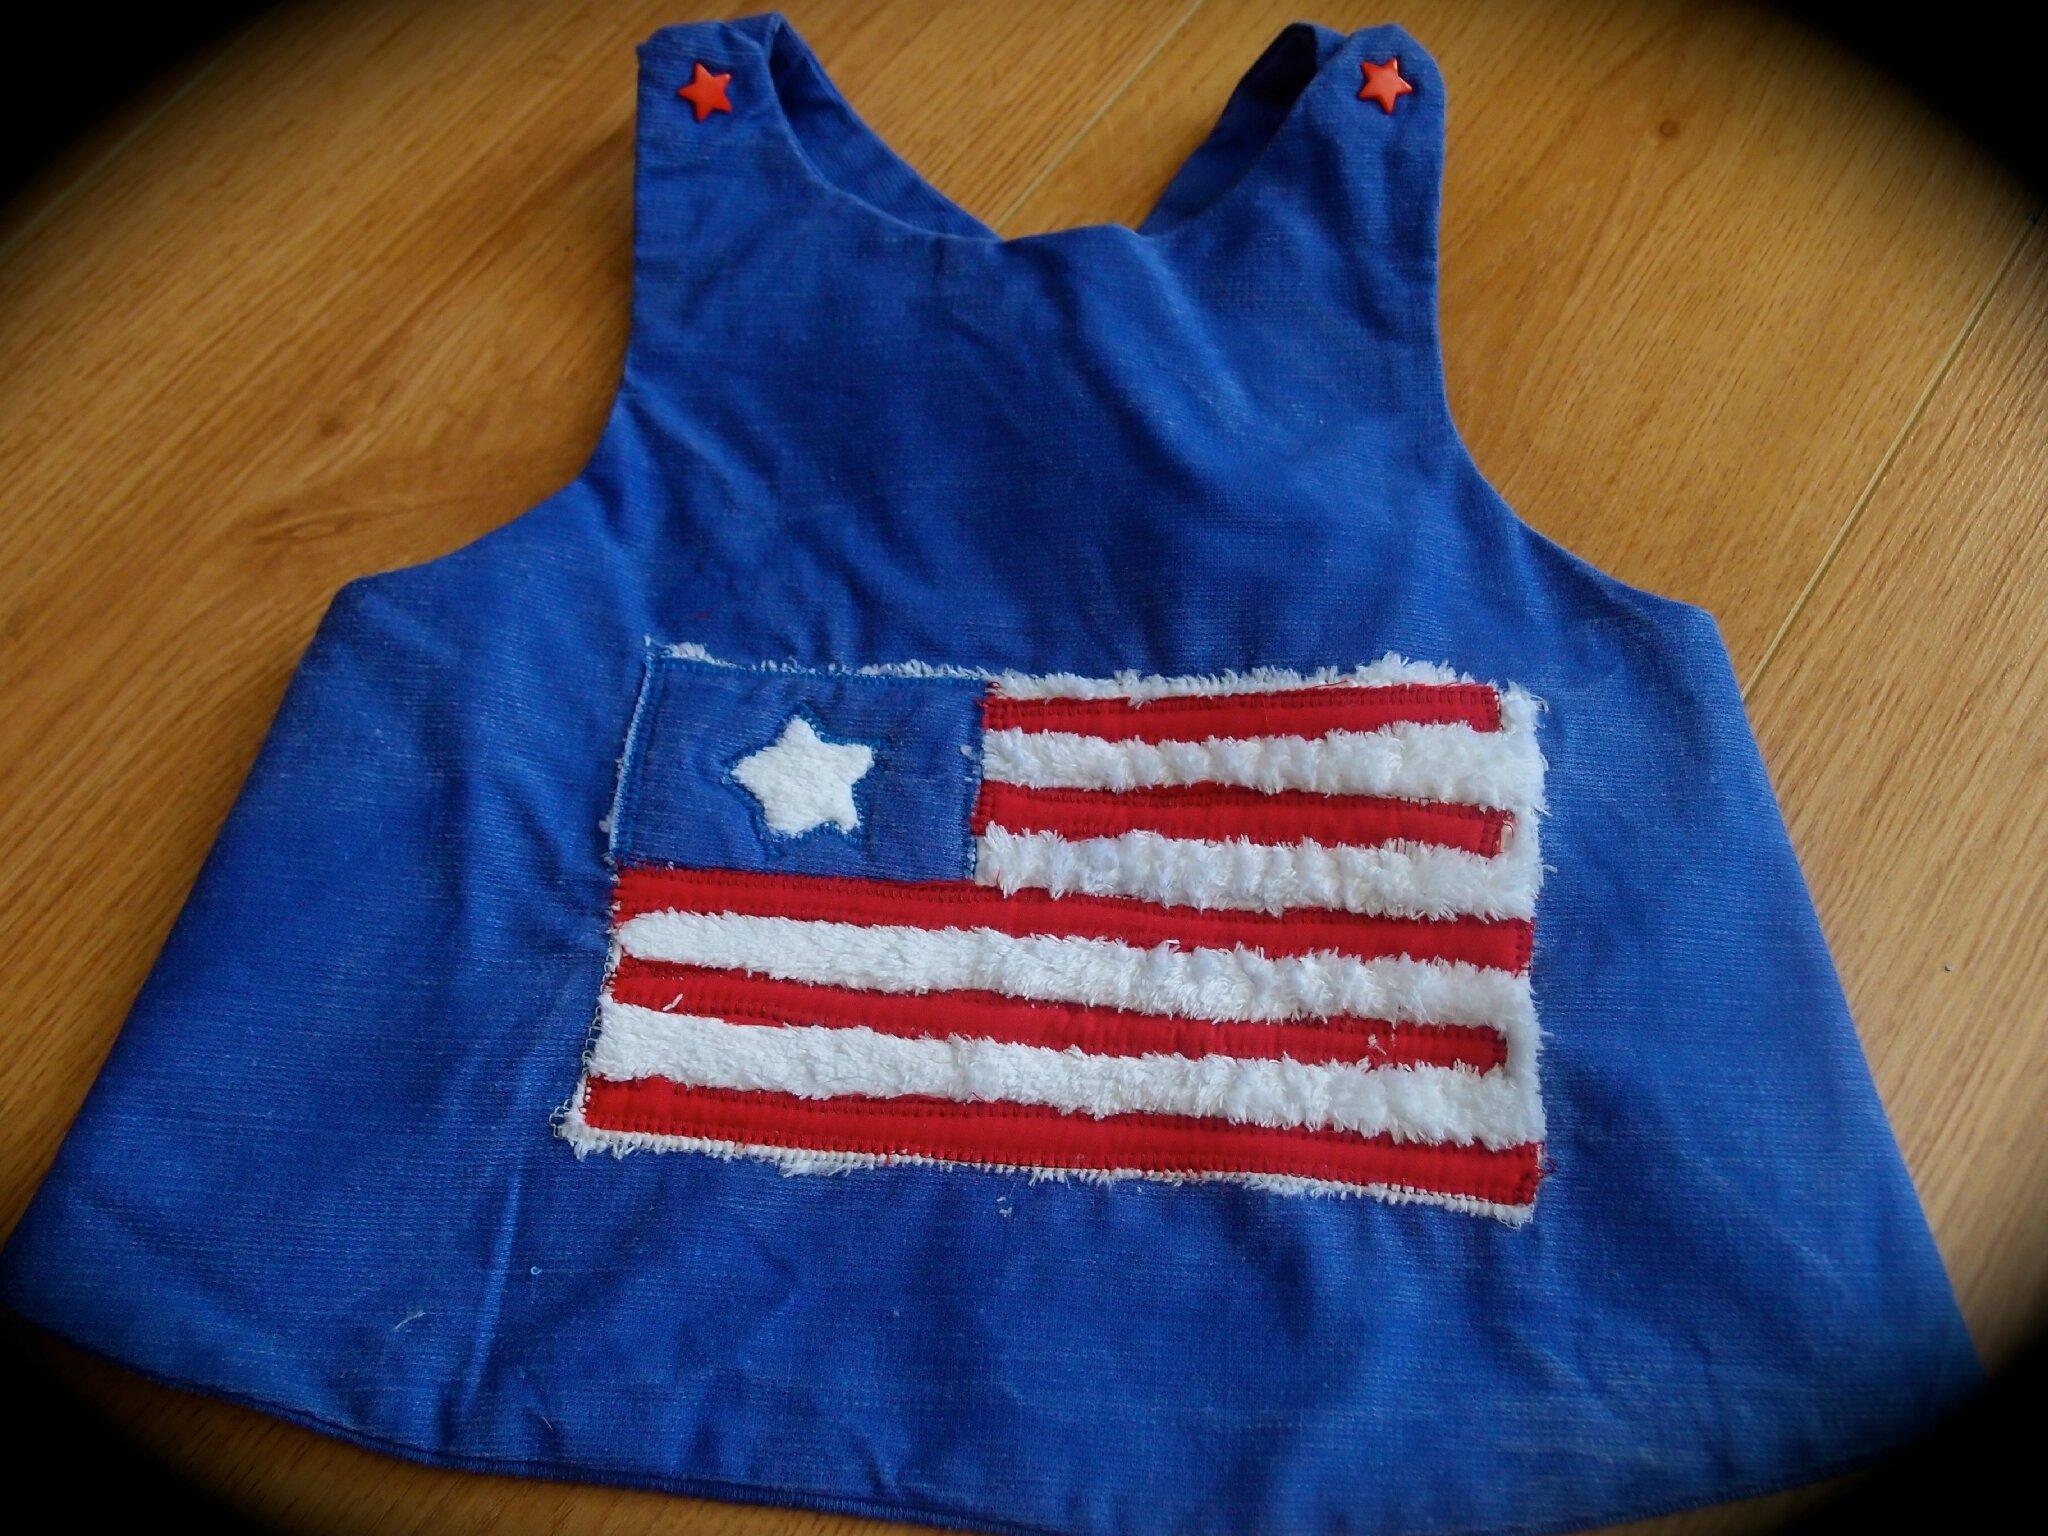 Enfant-Robe_tablier_USA2